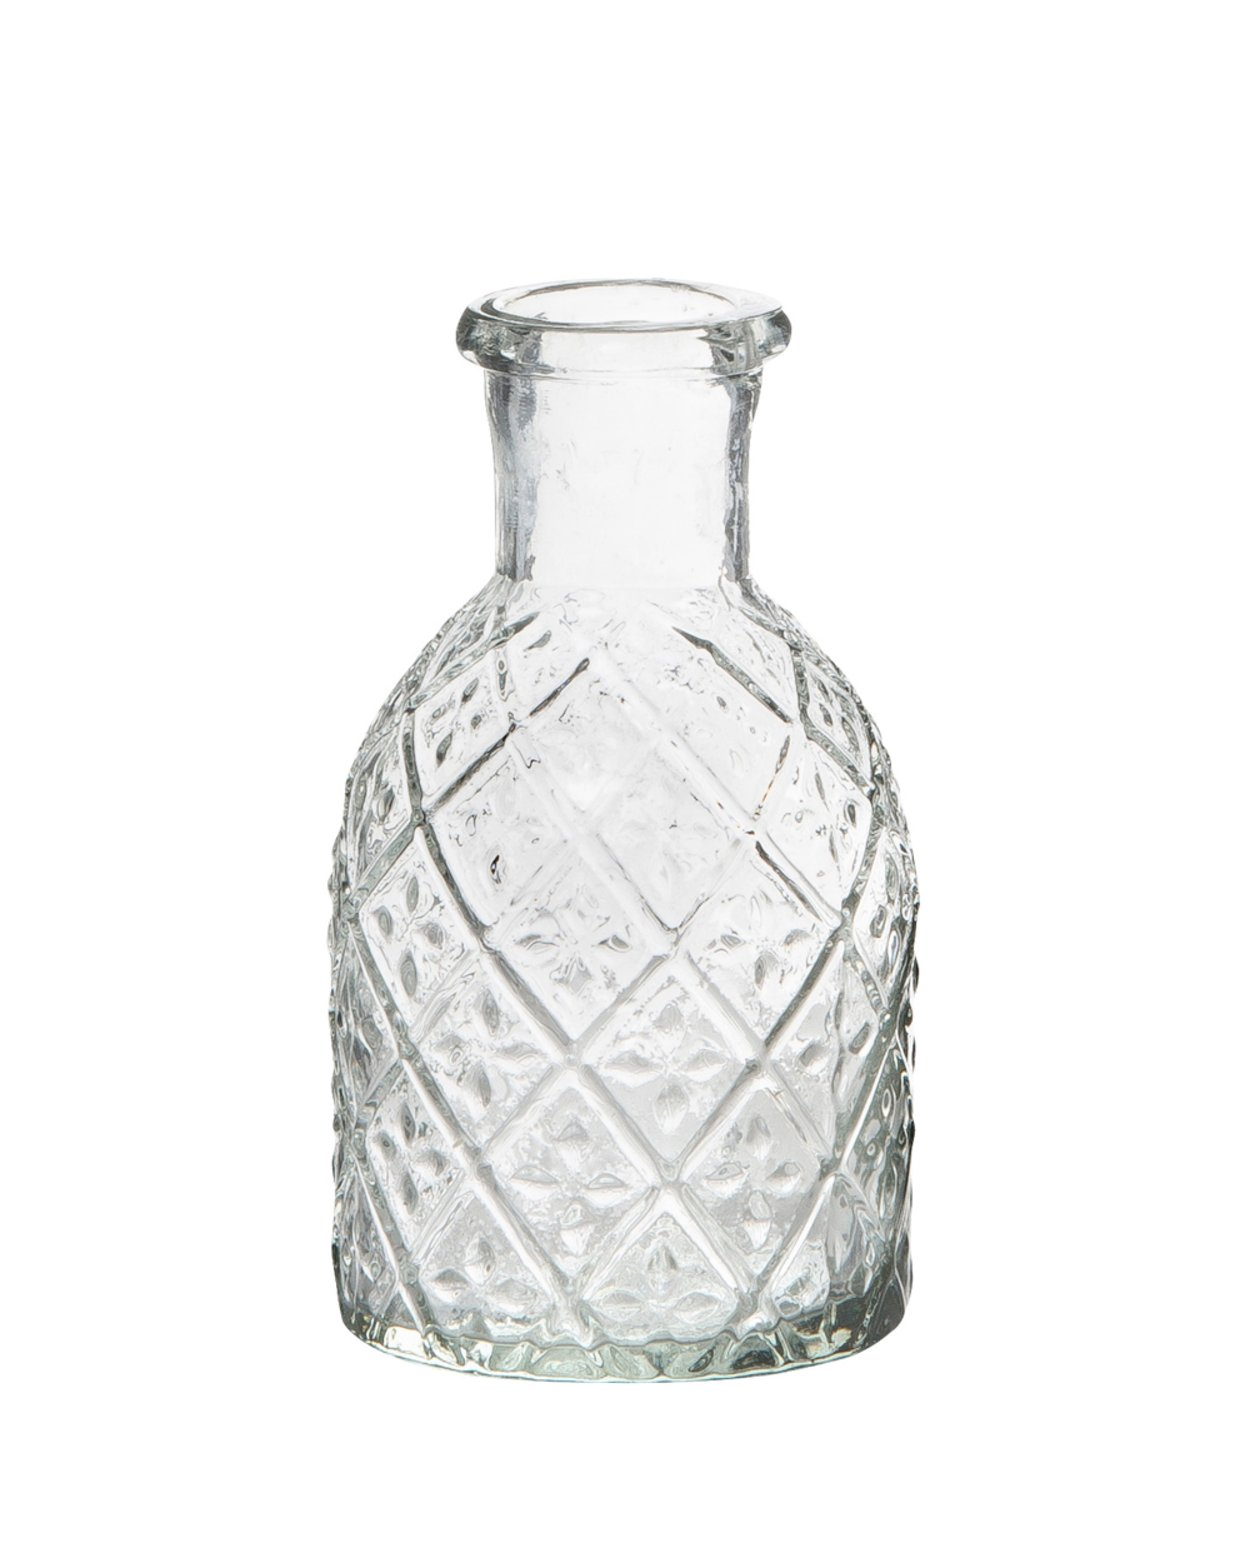 Harlequin Pharmacy Glass Candle Vase